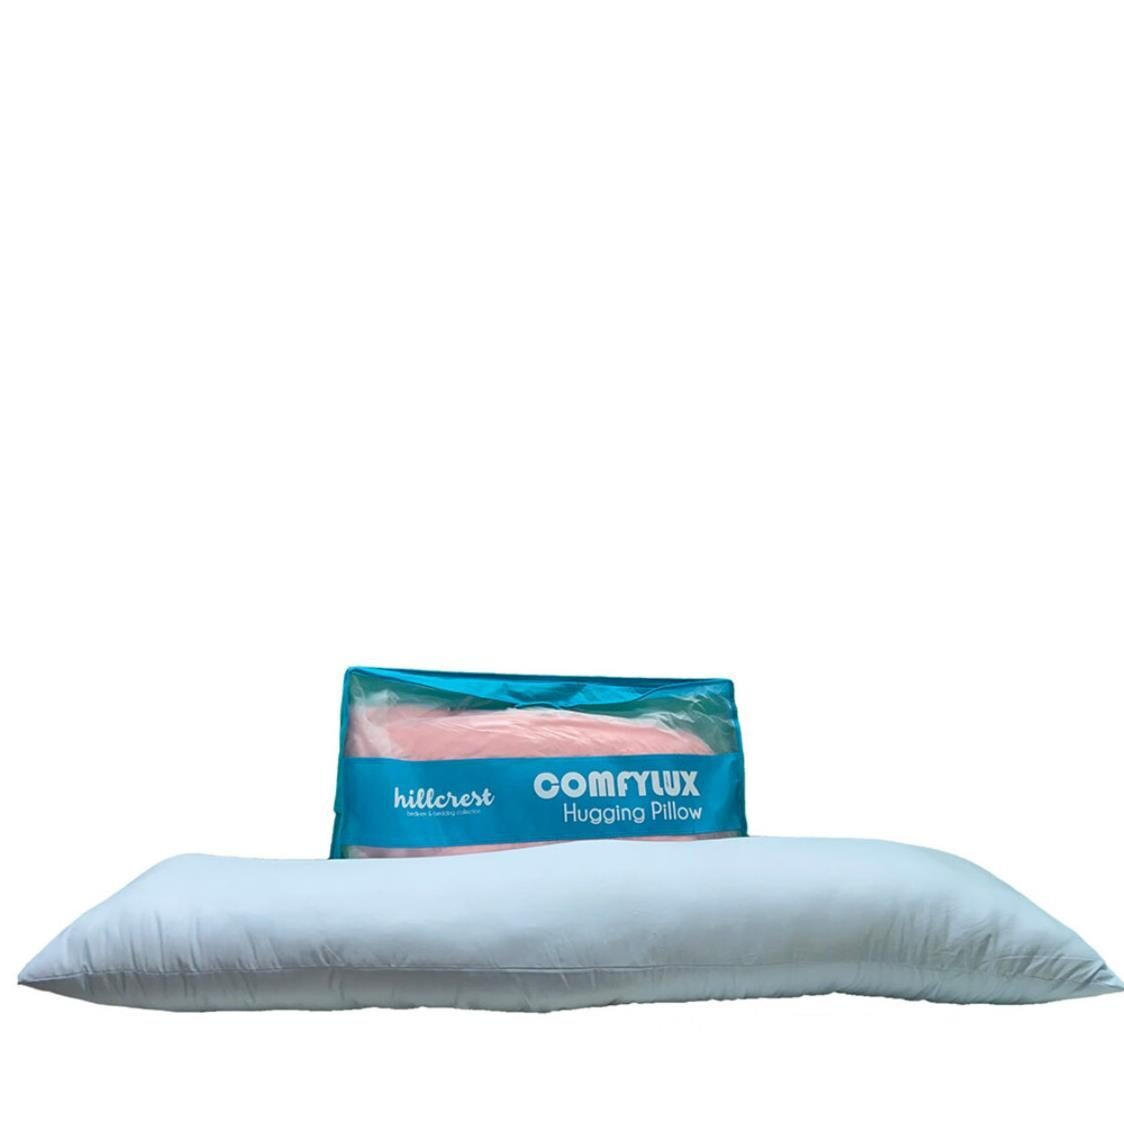 Hillcrest ComfyLux Hugging Pillow